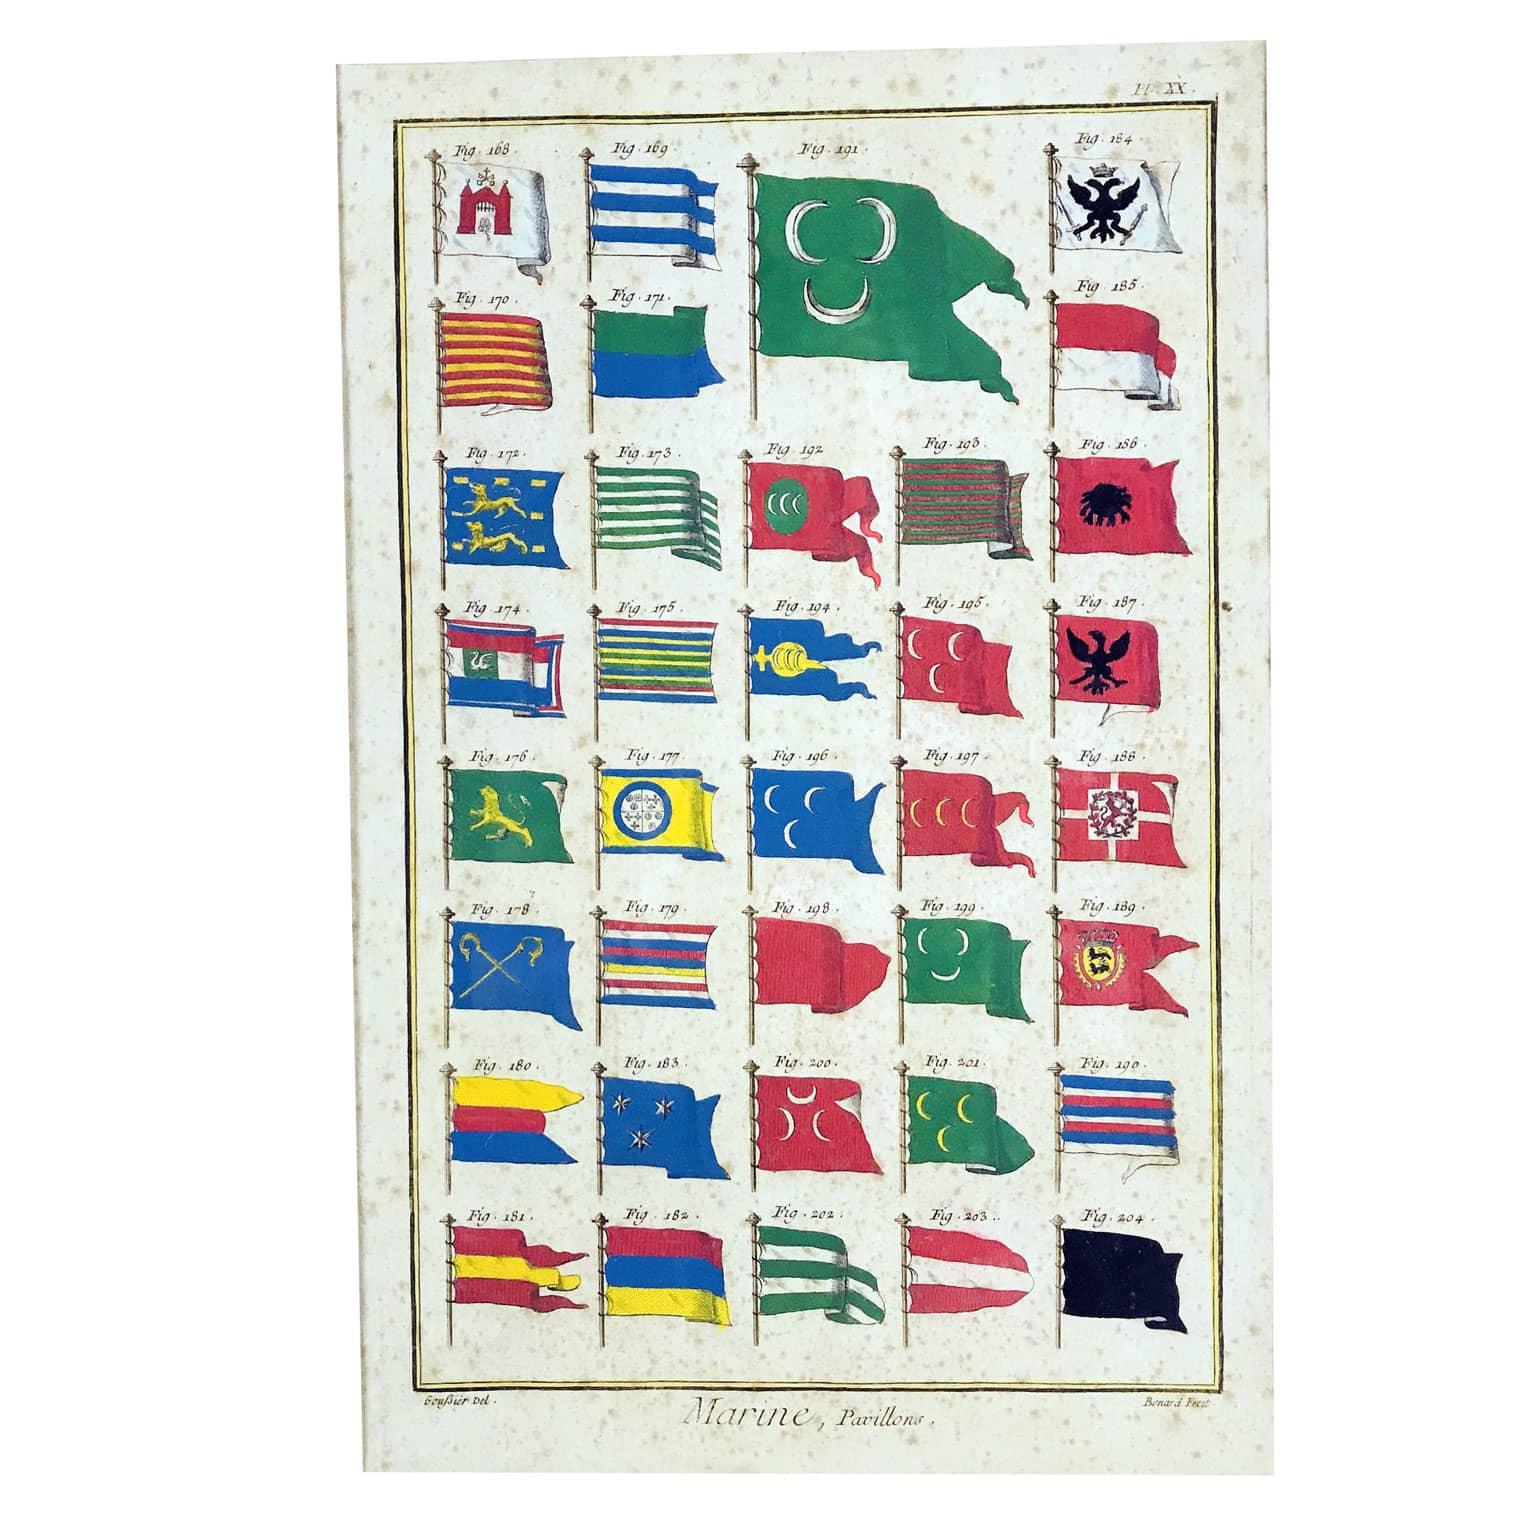 Bandiere Navali dall'Enciclopedia di Diderot e D'Alembert, 1770 circa